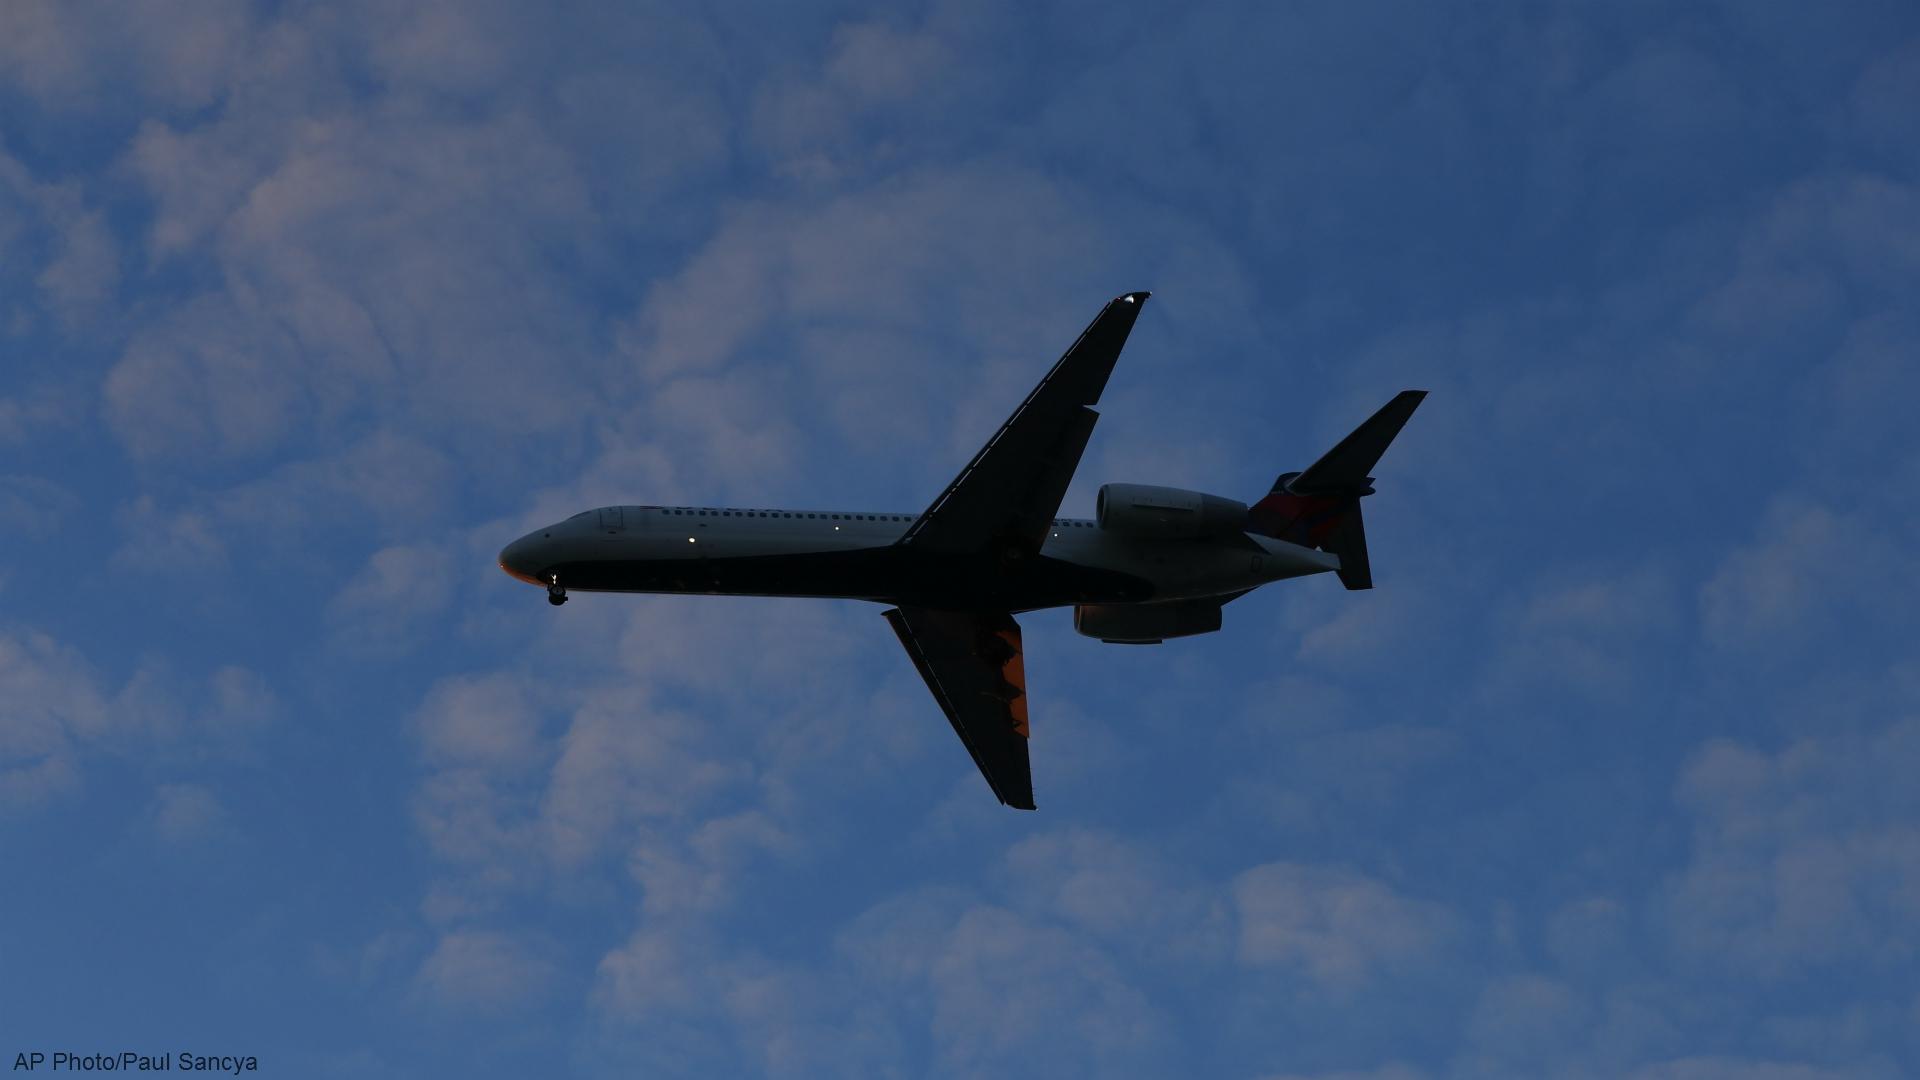 delta airlines detroit metropolitian airport file_1528054871375.jpg.jpg